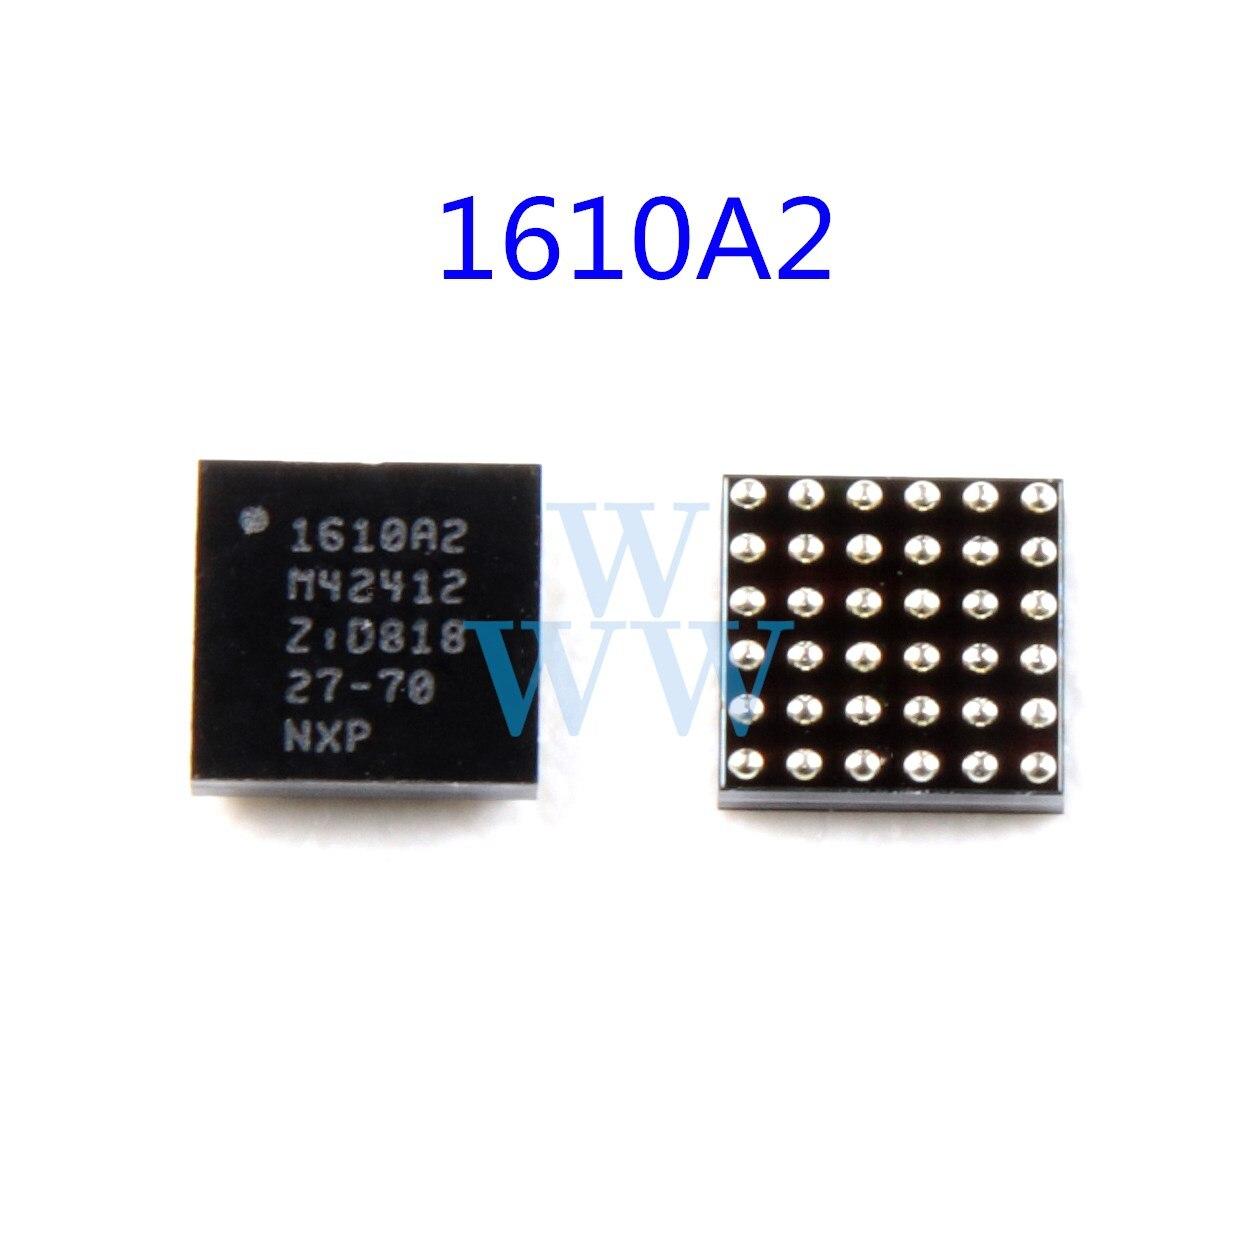 1 pçs original 1610a2 carregador de carregamento ic chip para iphone 6 6g 6 plus u1700 usb ic chip 1610 1610a 36pin